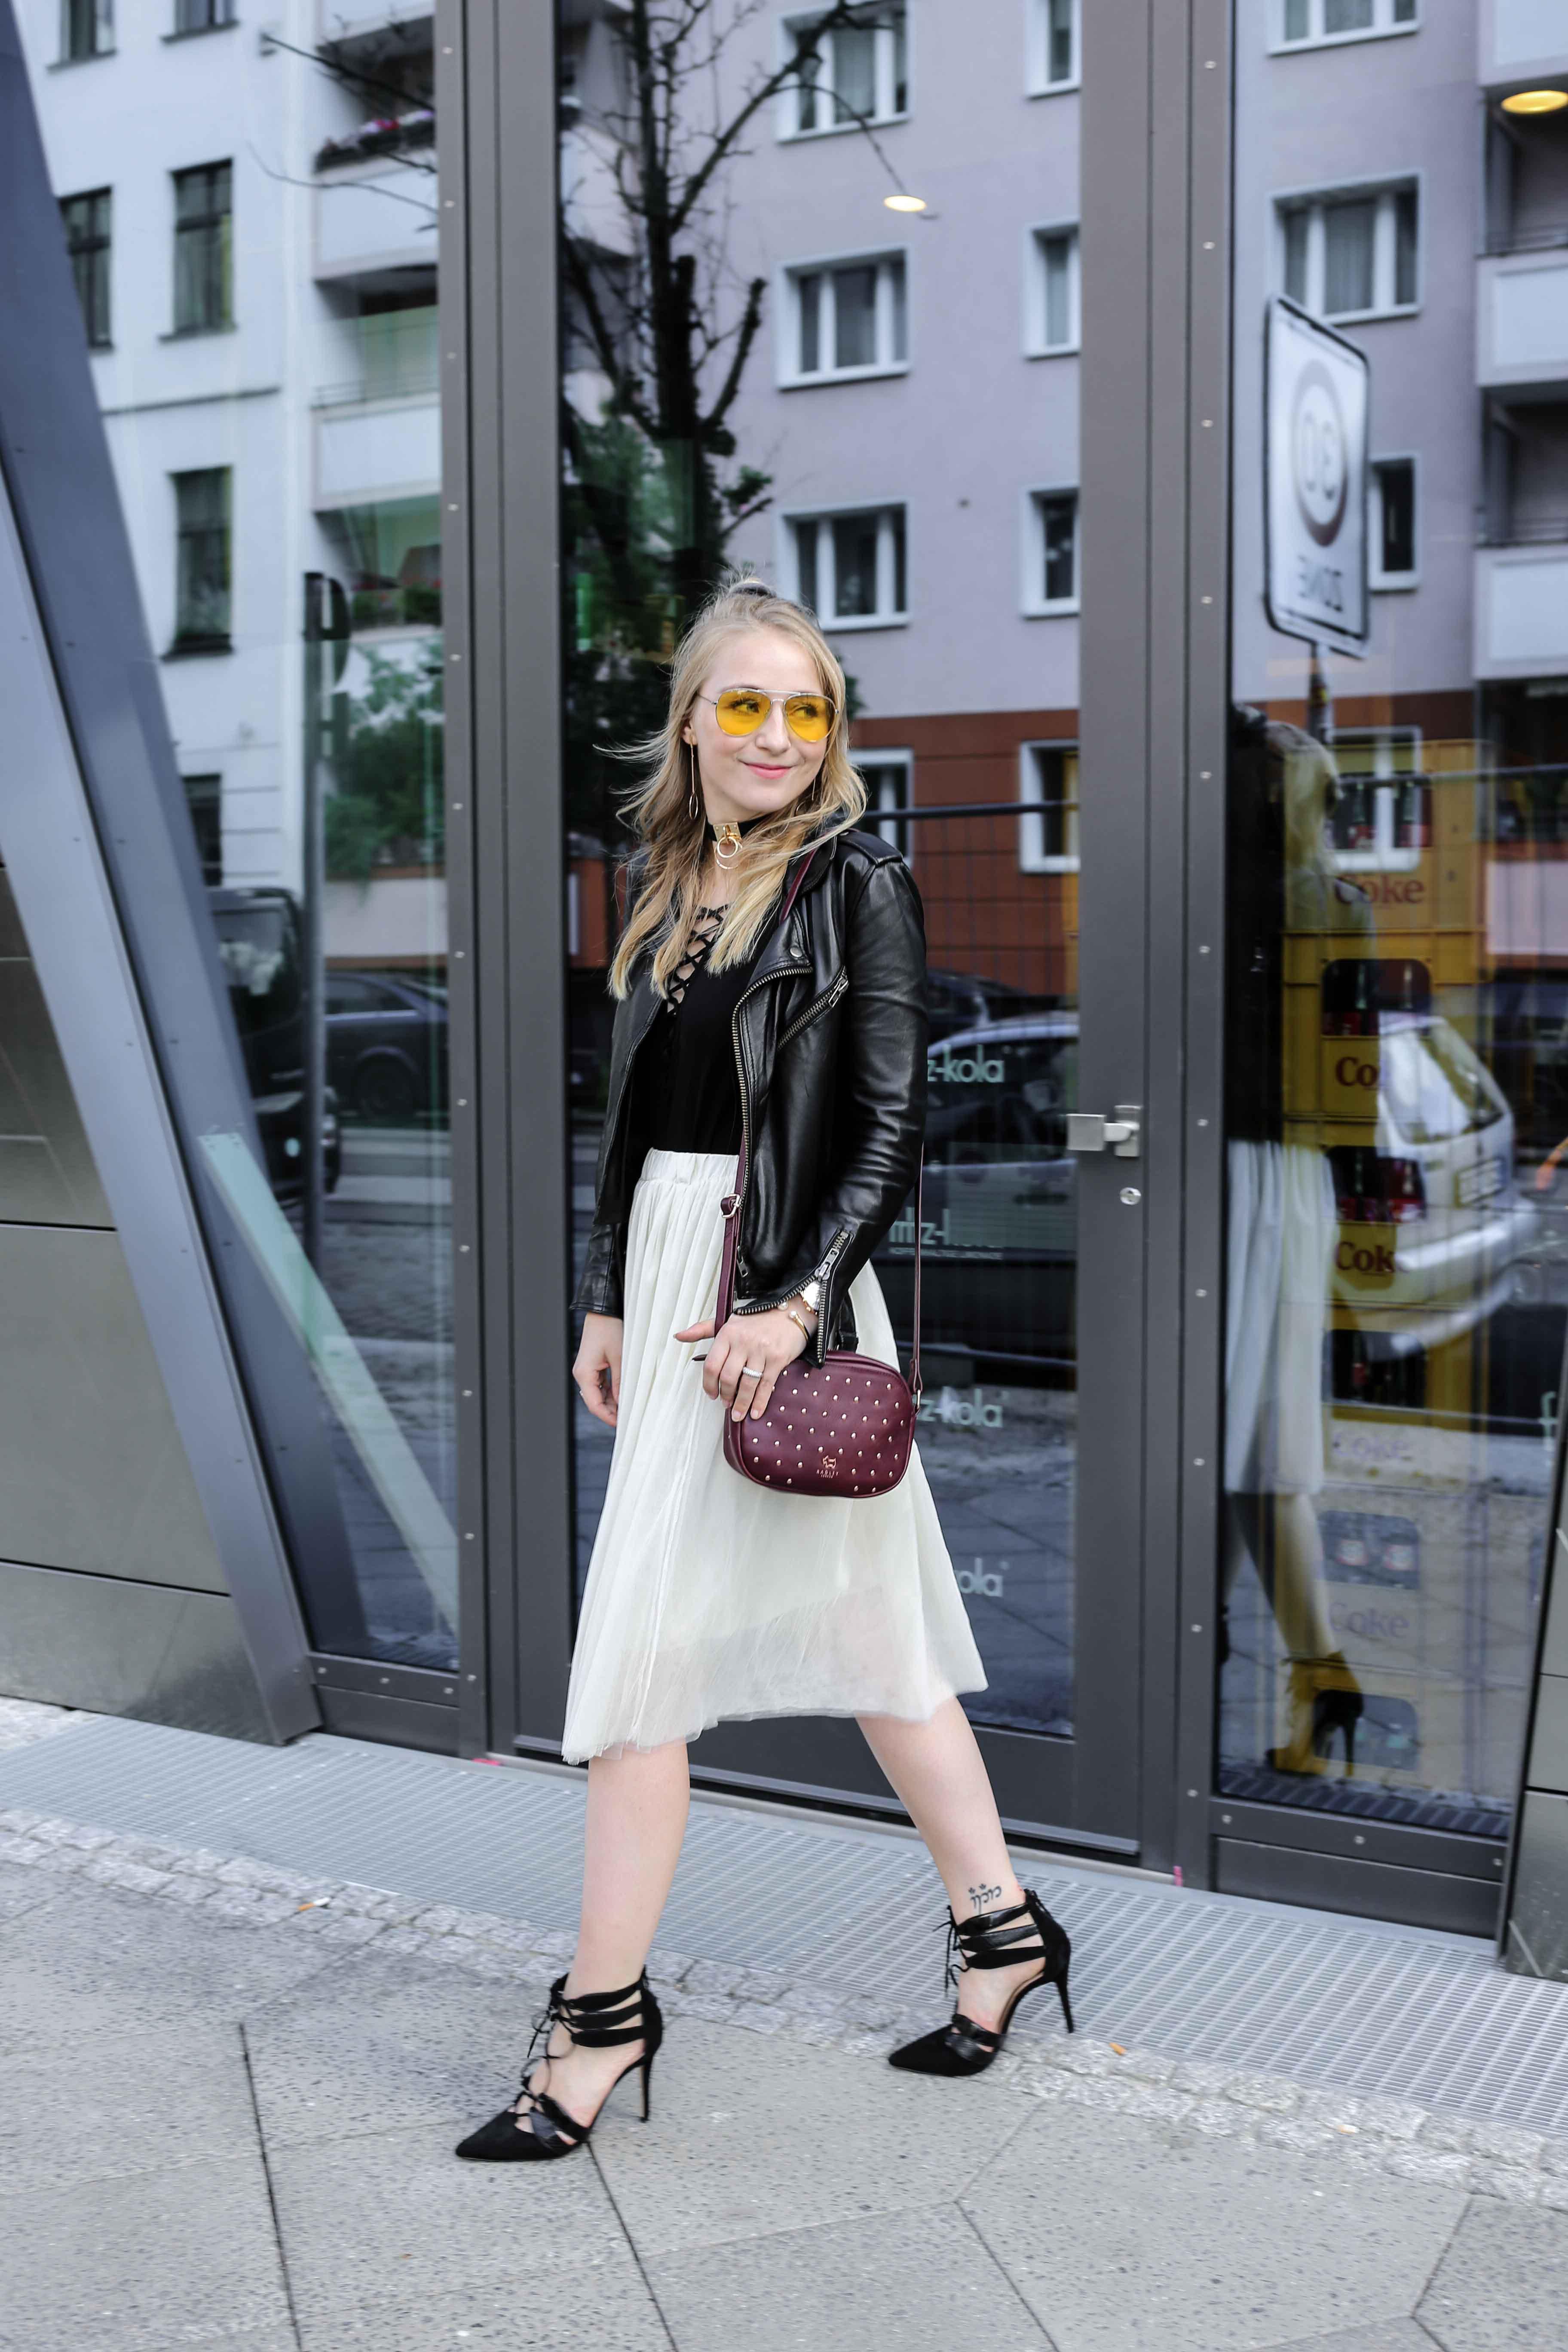 fashion-week-look-schnürbody-plisseerock-retro-sonnenbrille-fashionblog-modeblog-berlin-köln_8792